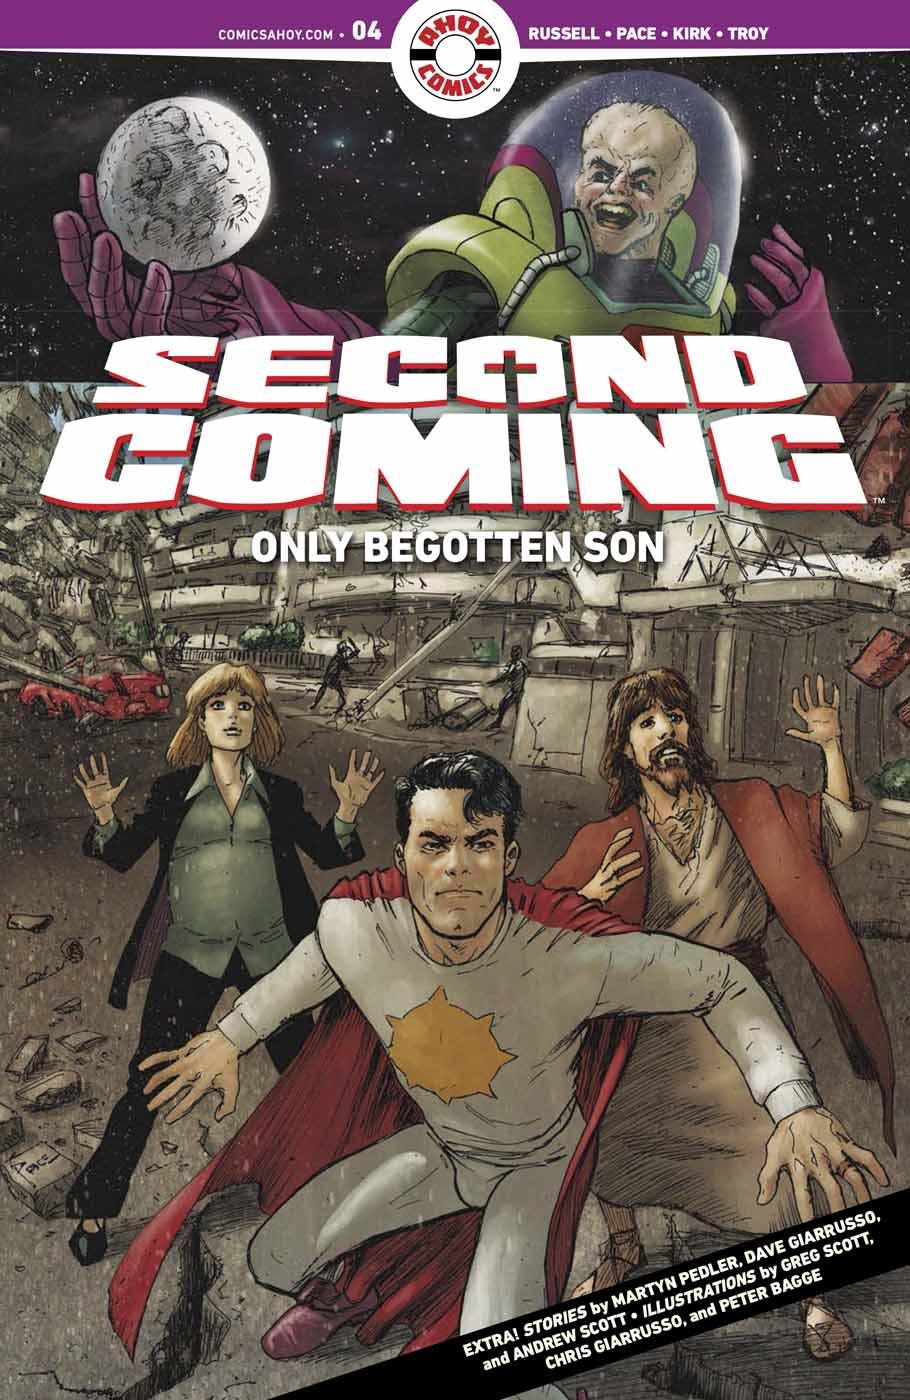 secondcoming4c